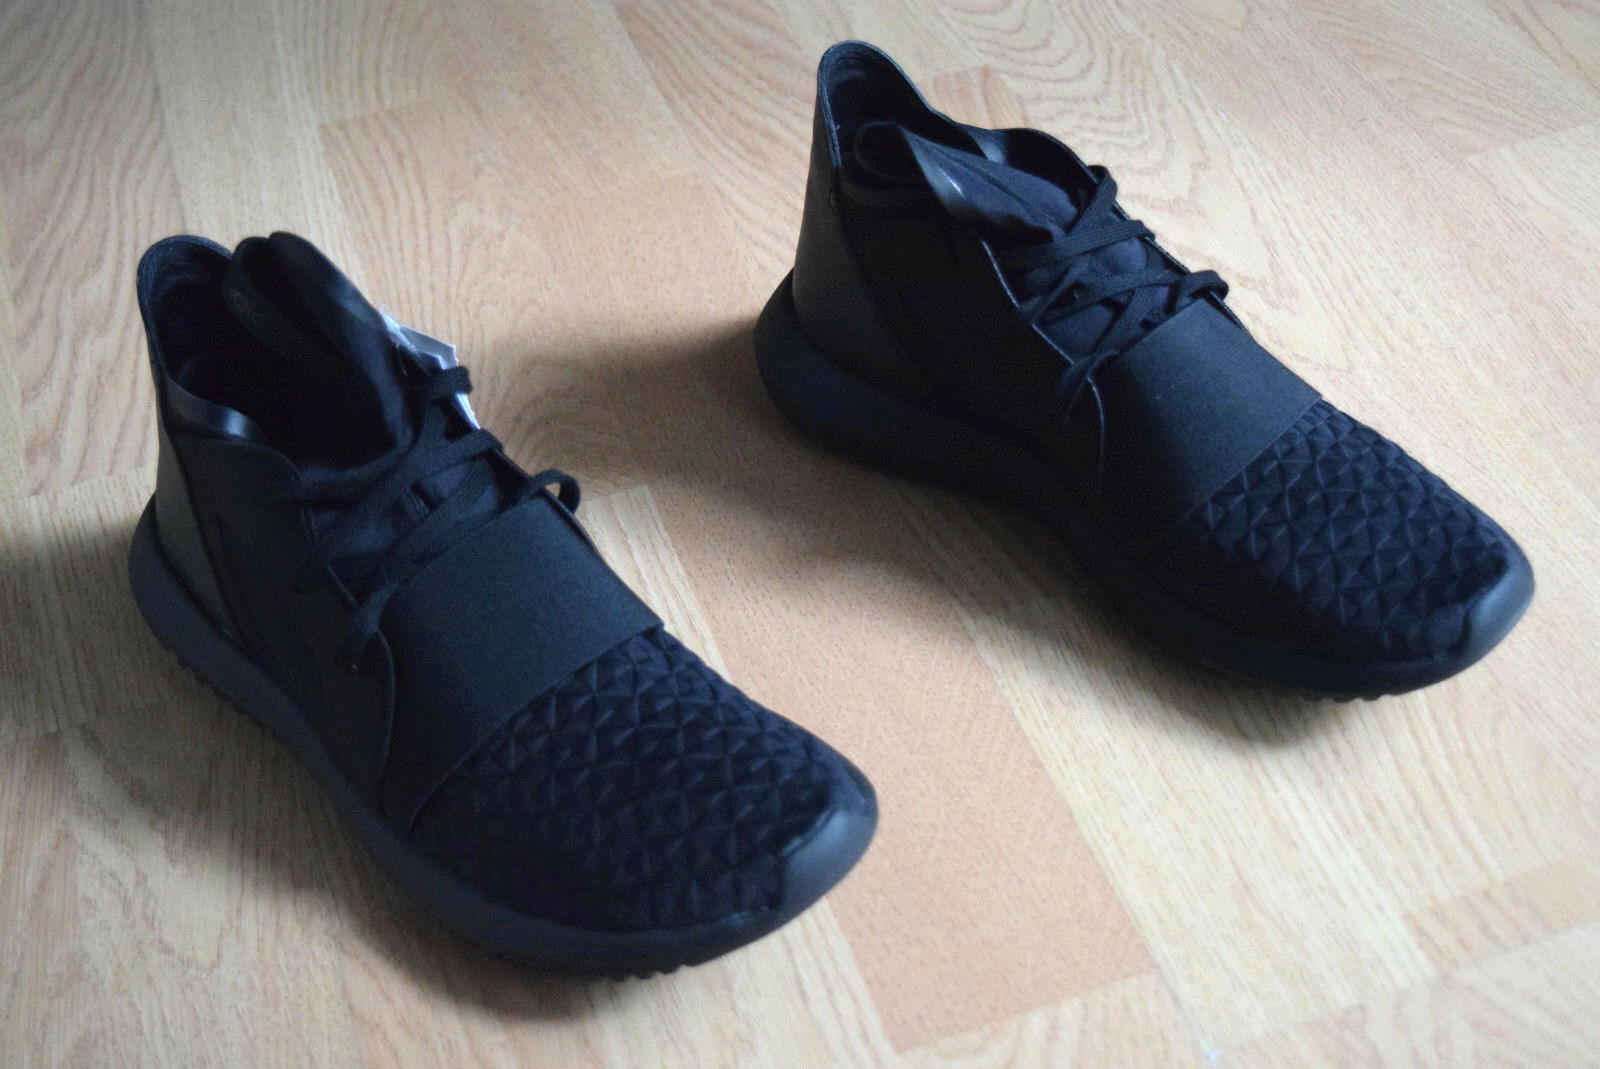 Adidas Tubular Defiant W 40,5  38 39 40 40,5 W S75900 runner yeEzY nova viral supeRstar 2c427d